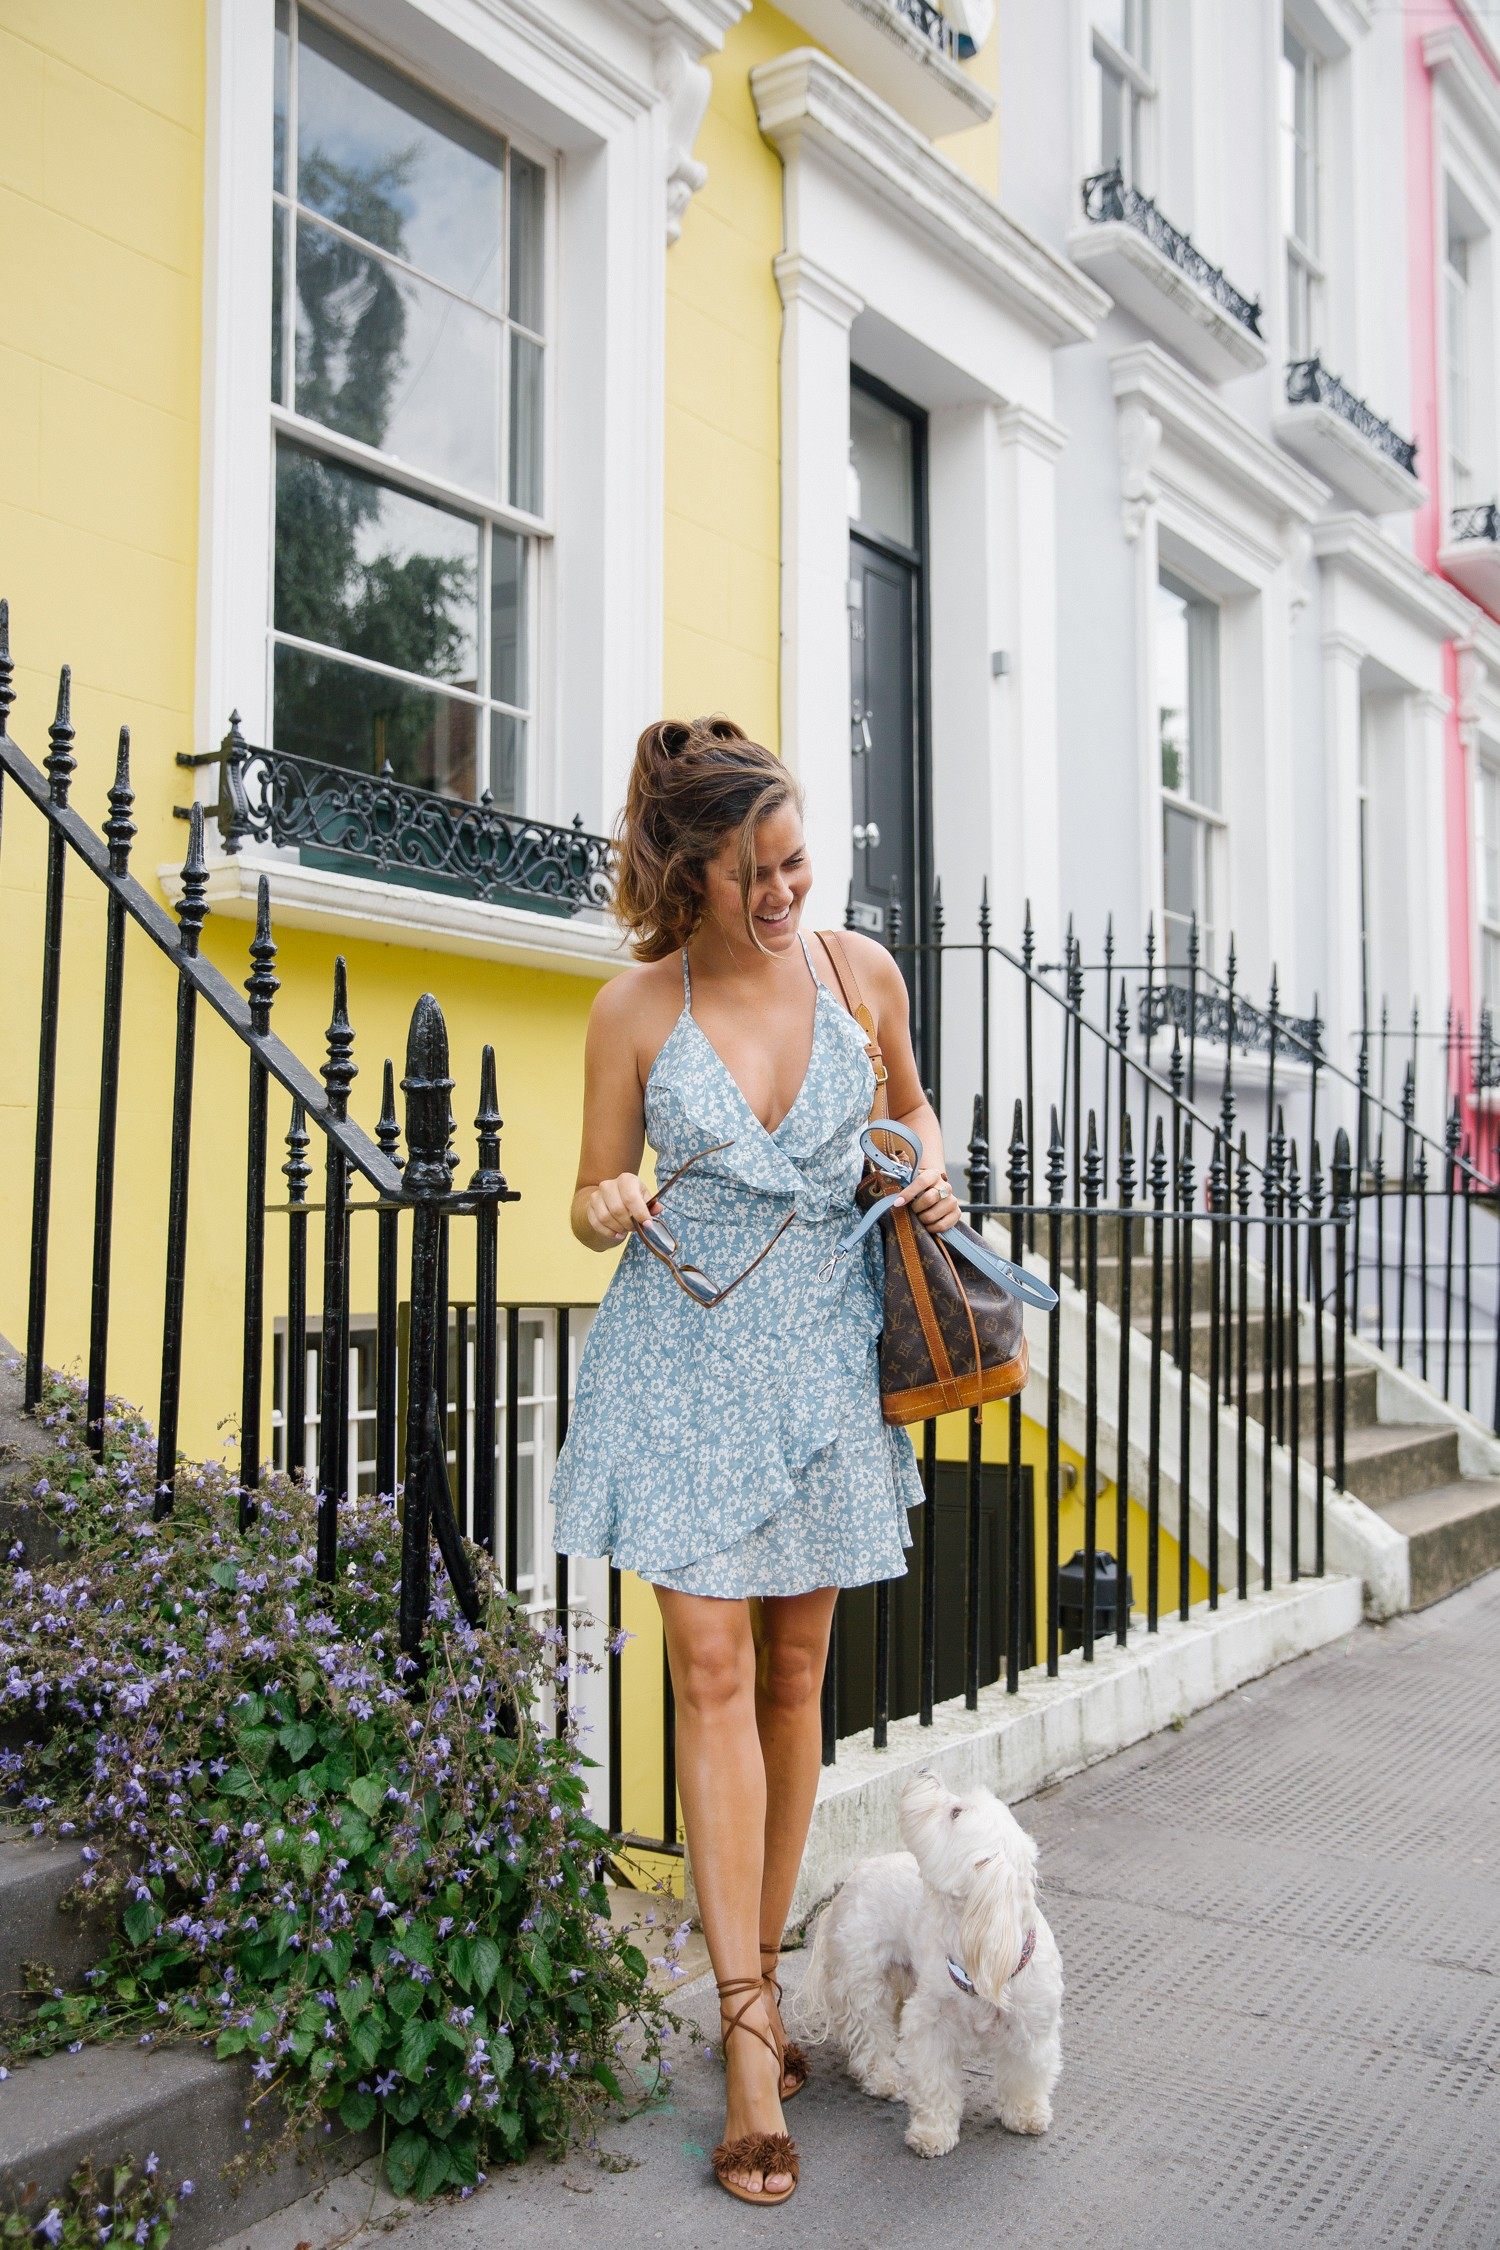 Farmacy Notting Hill-4